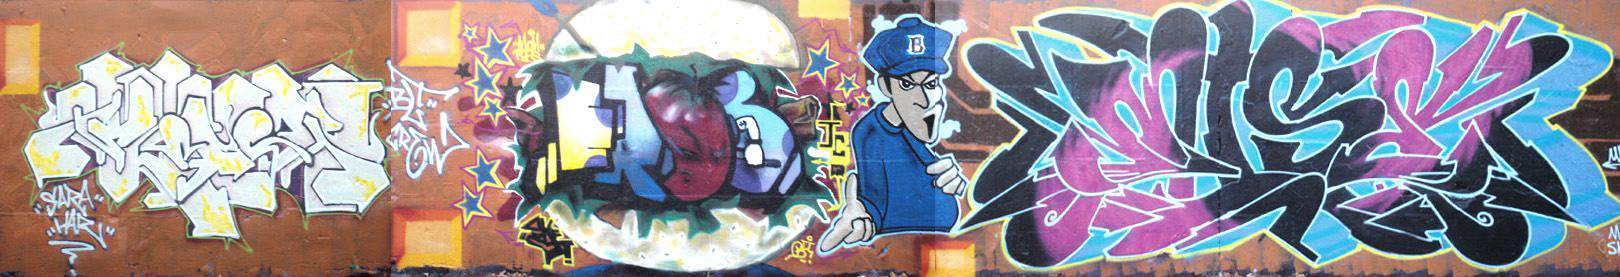 Art Crimes: Boston 13